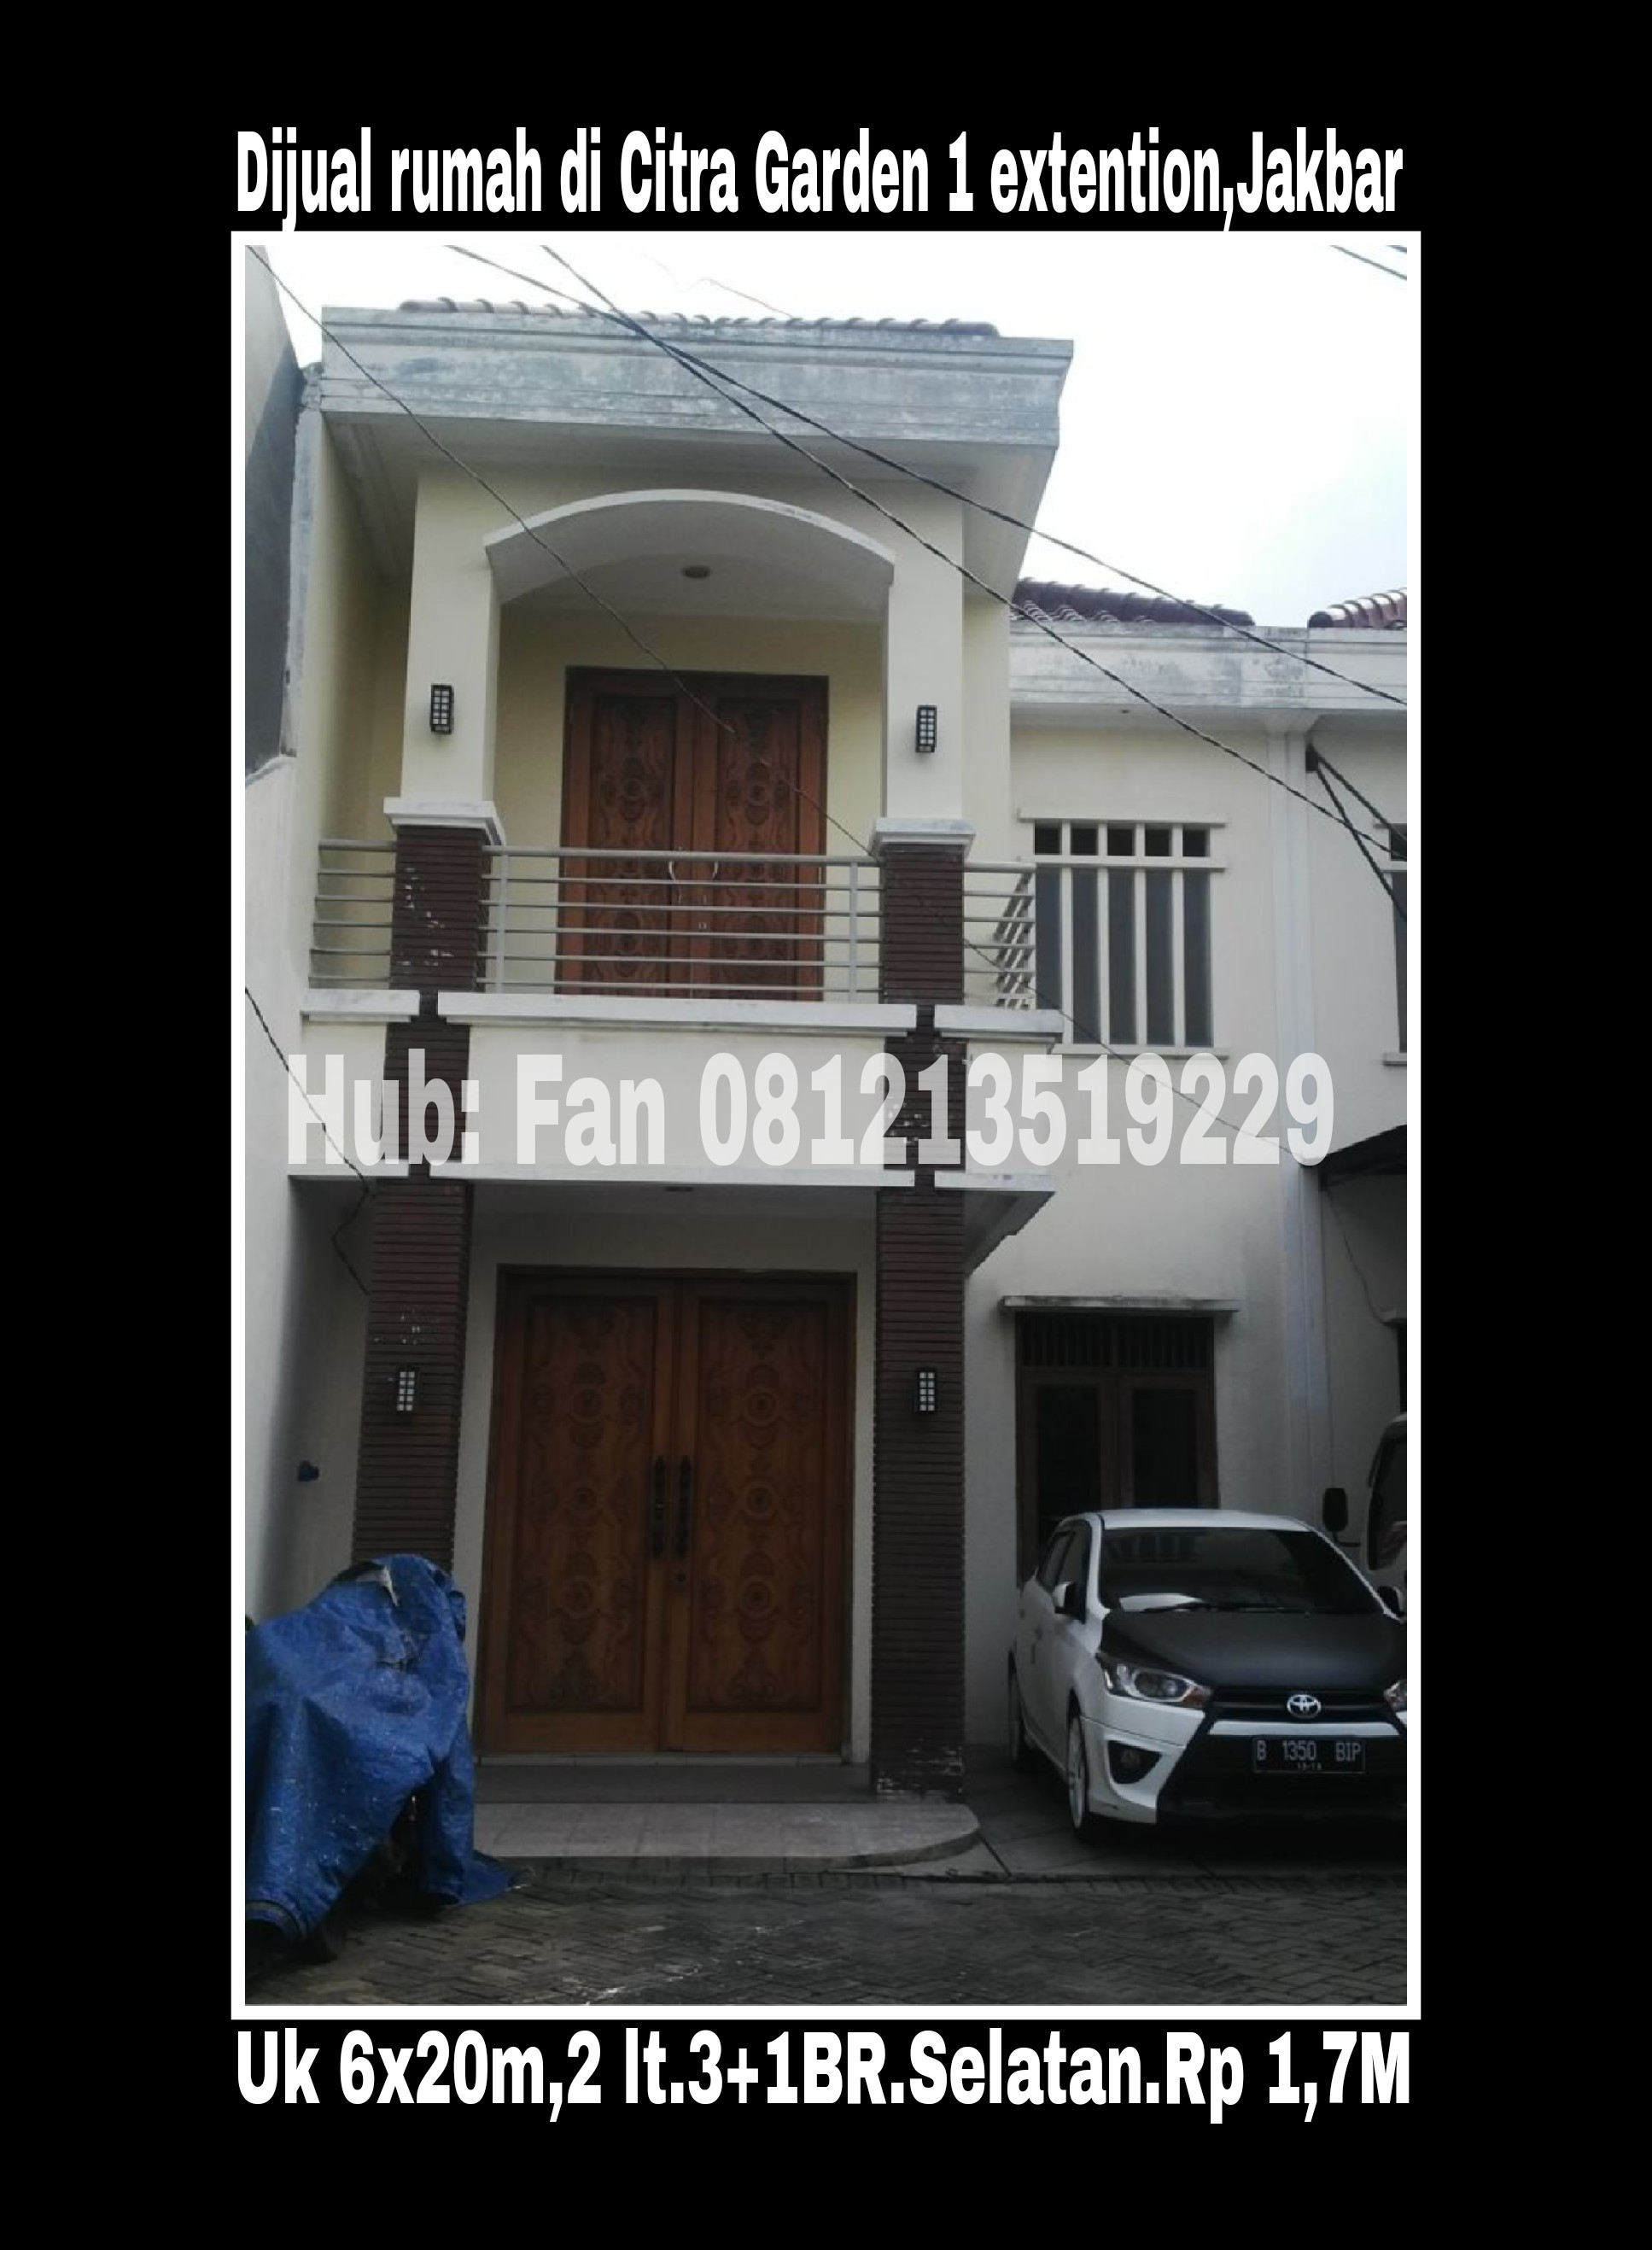 Rumah dijual di Citra 1 ext.jpg